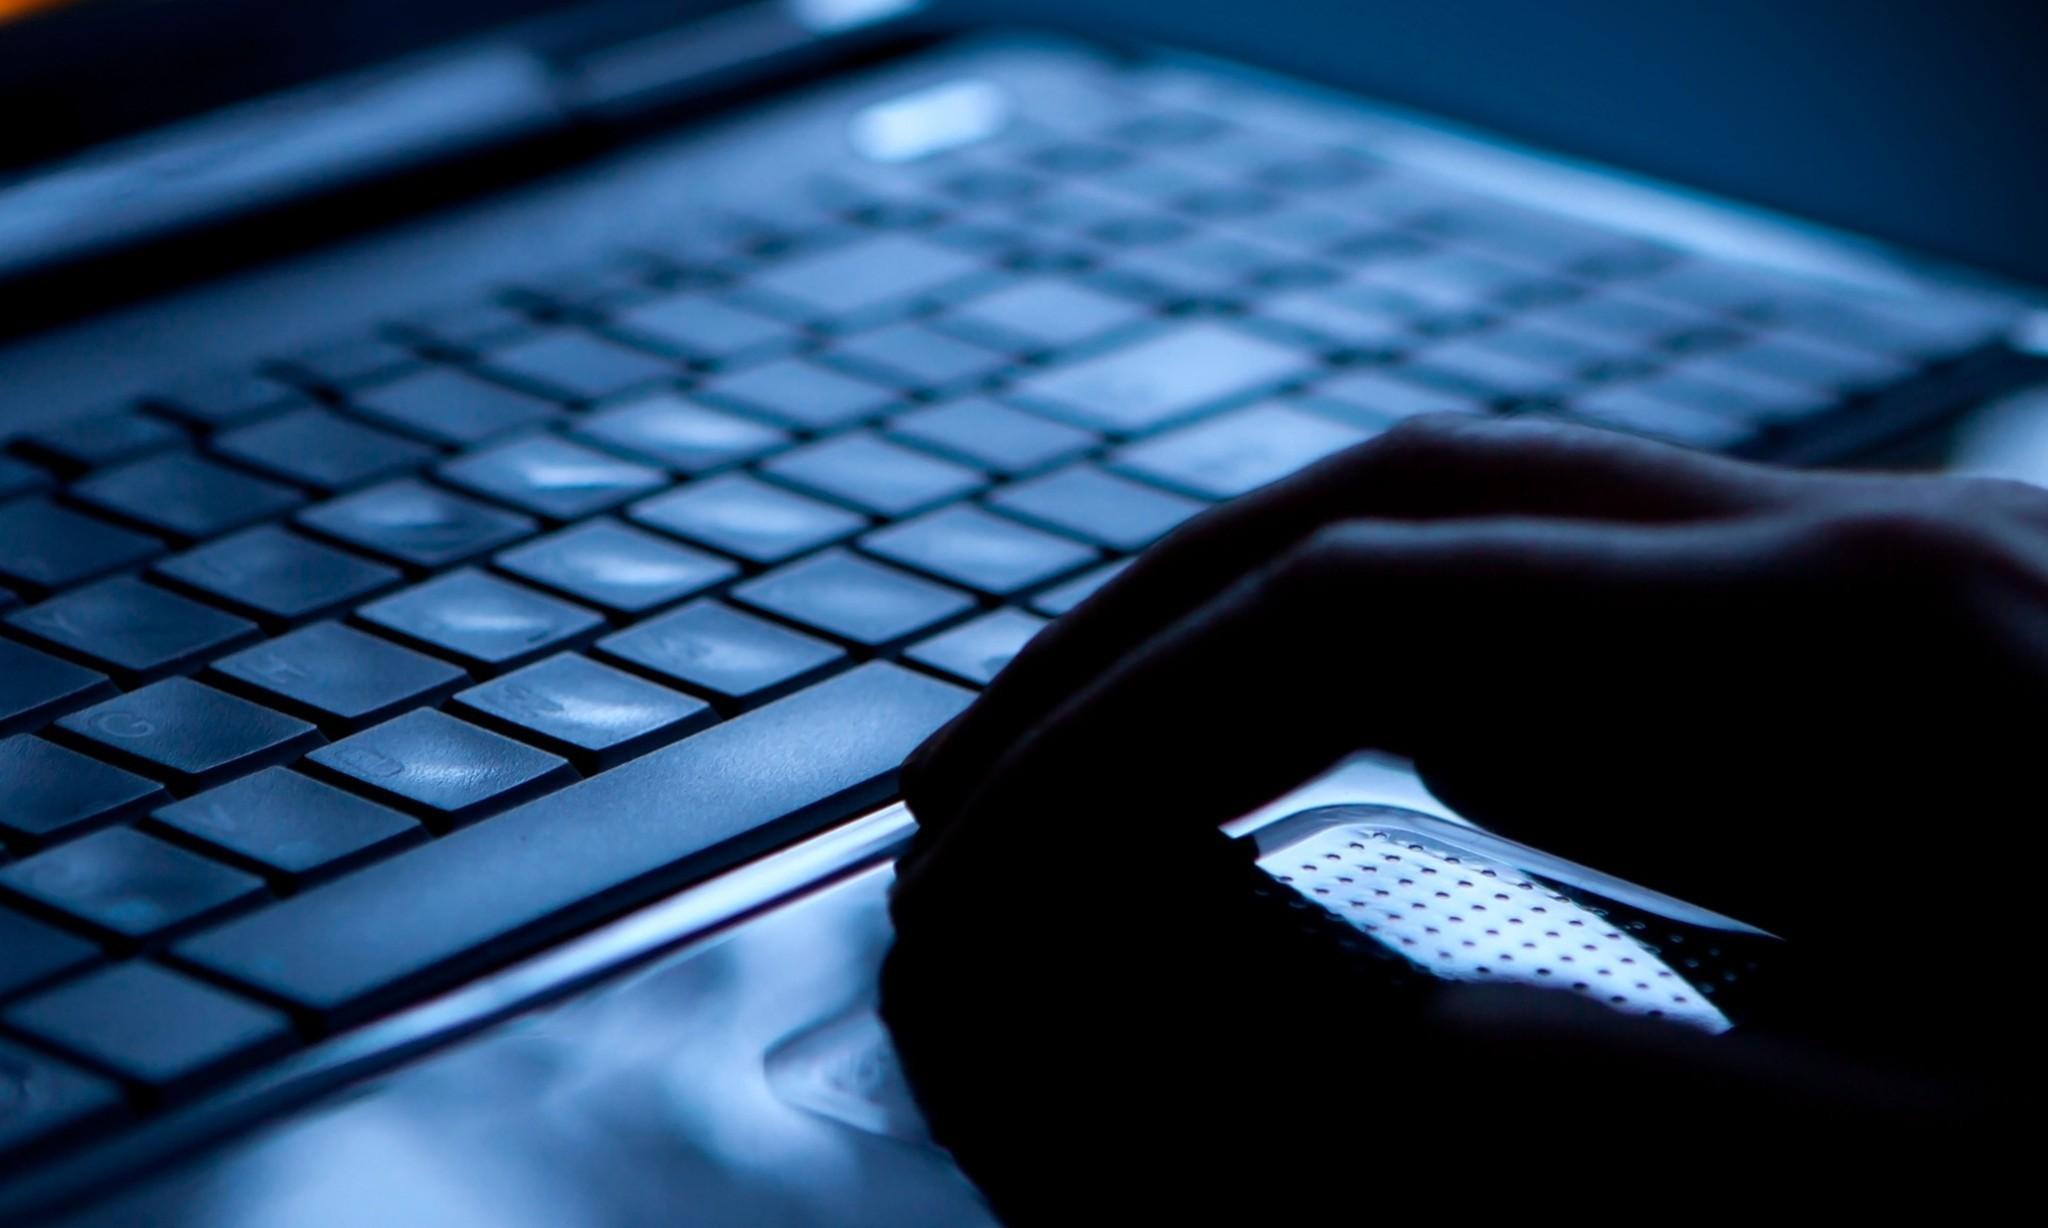 Silk Road 2.0 targeted in 'Operation Onymous' dark-web takedown